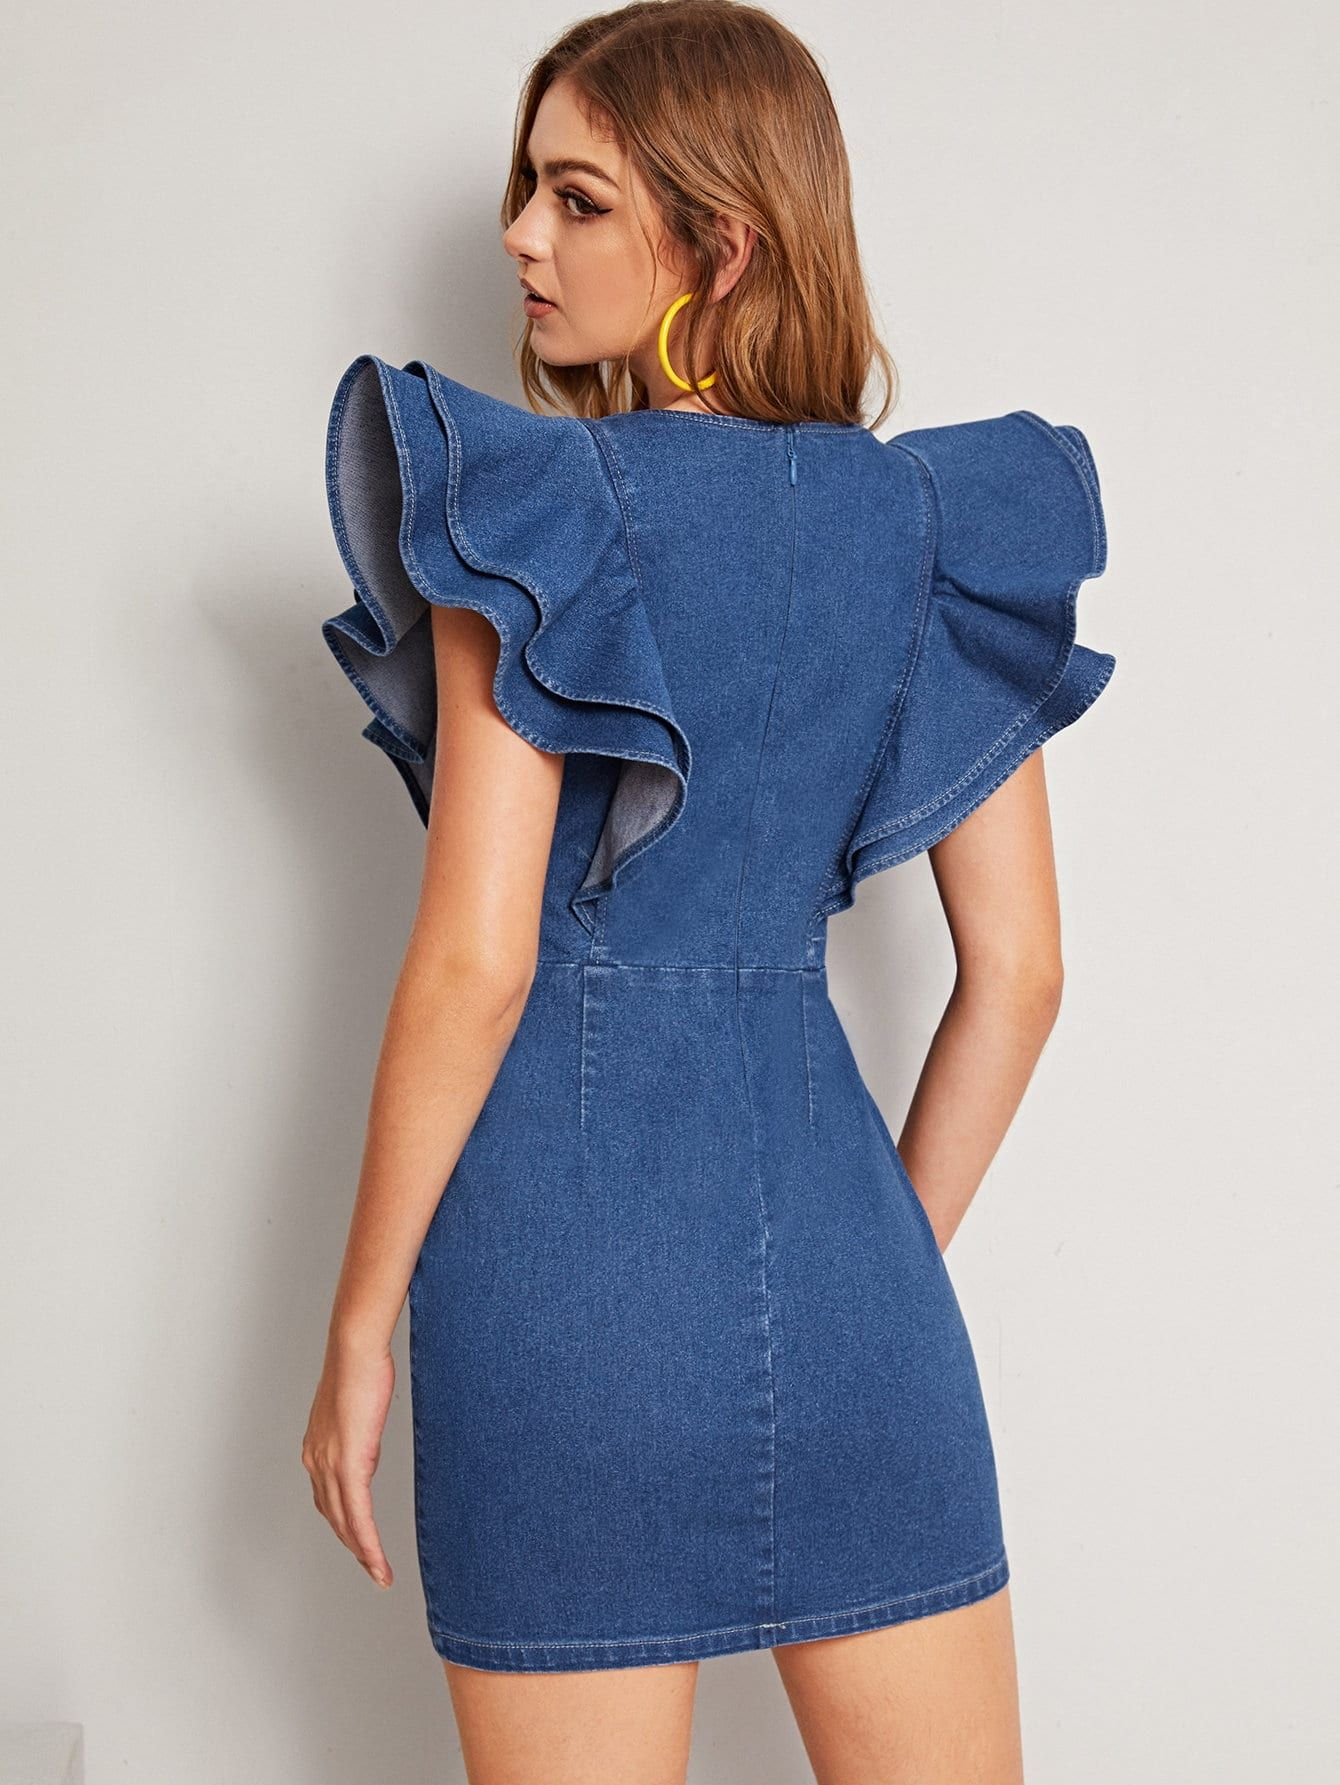 Pin On Denim Dresses [ 1785 x 1340 Pixel ]